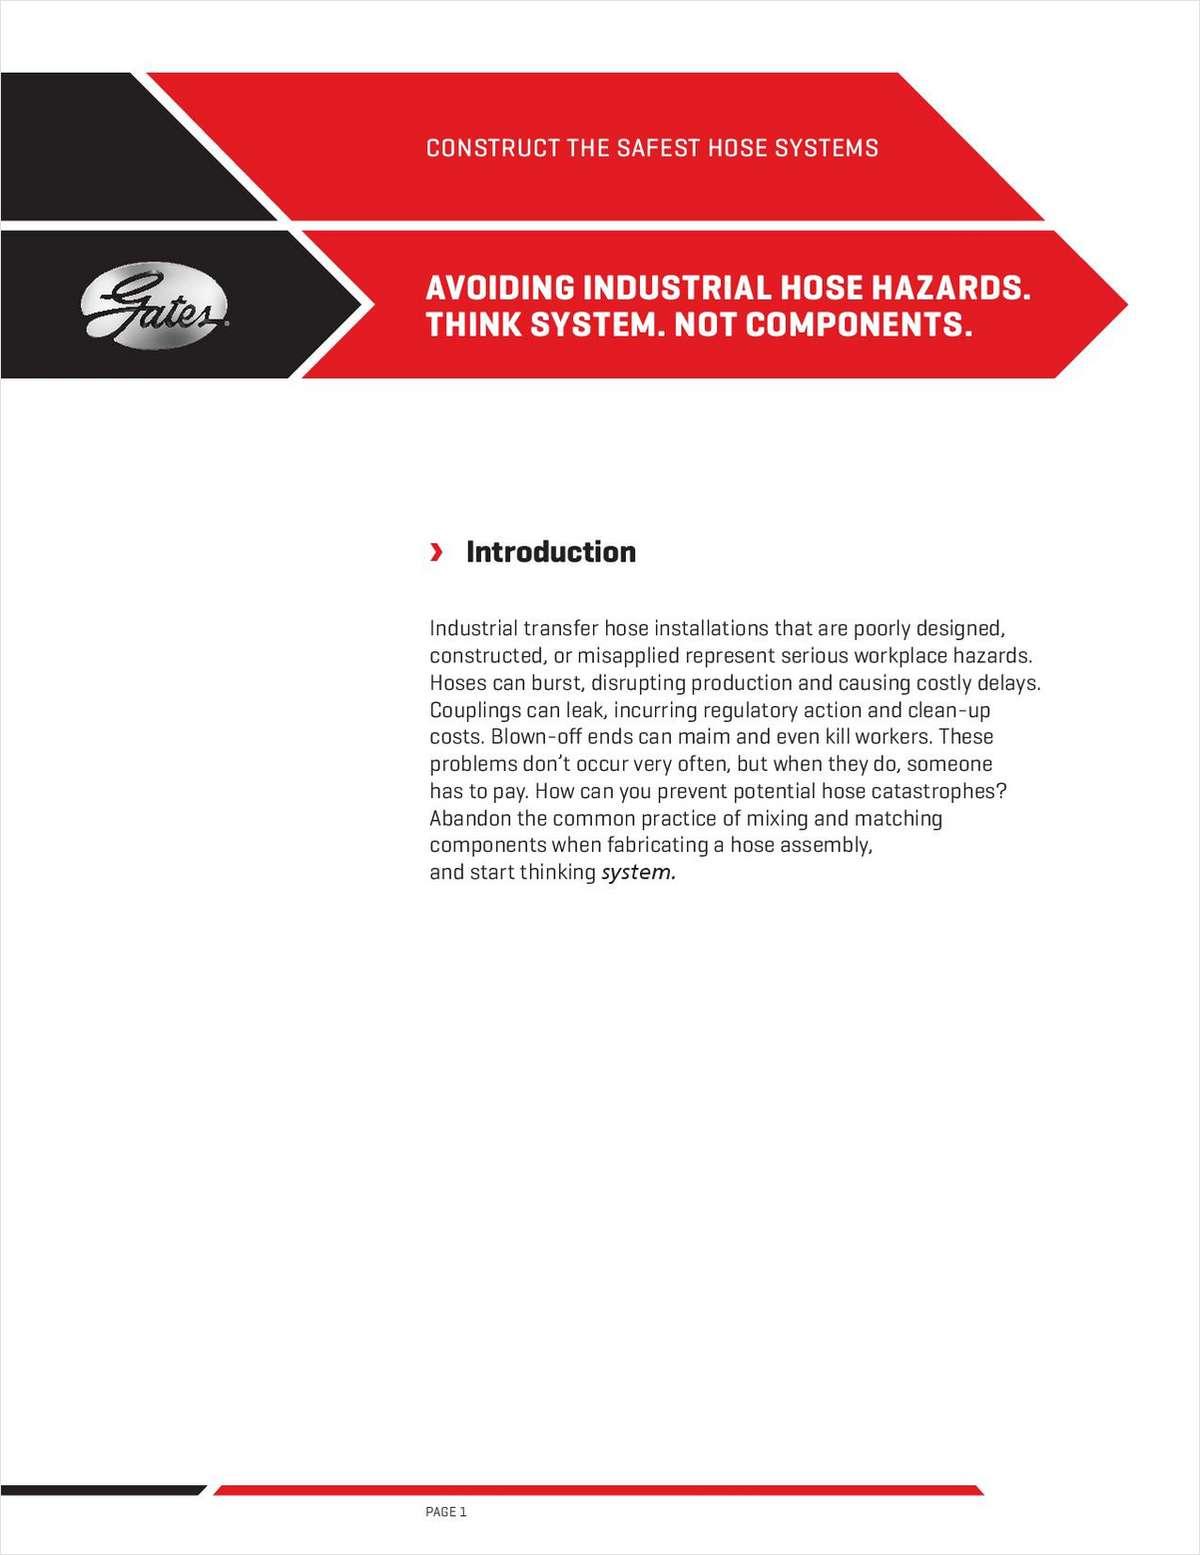 Avoiding Industrial Hose Hazards